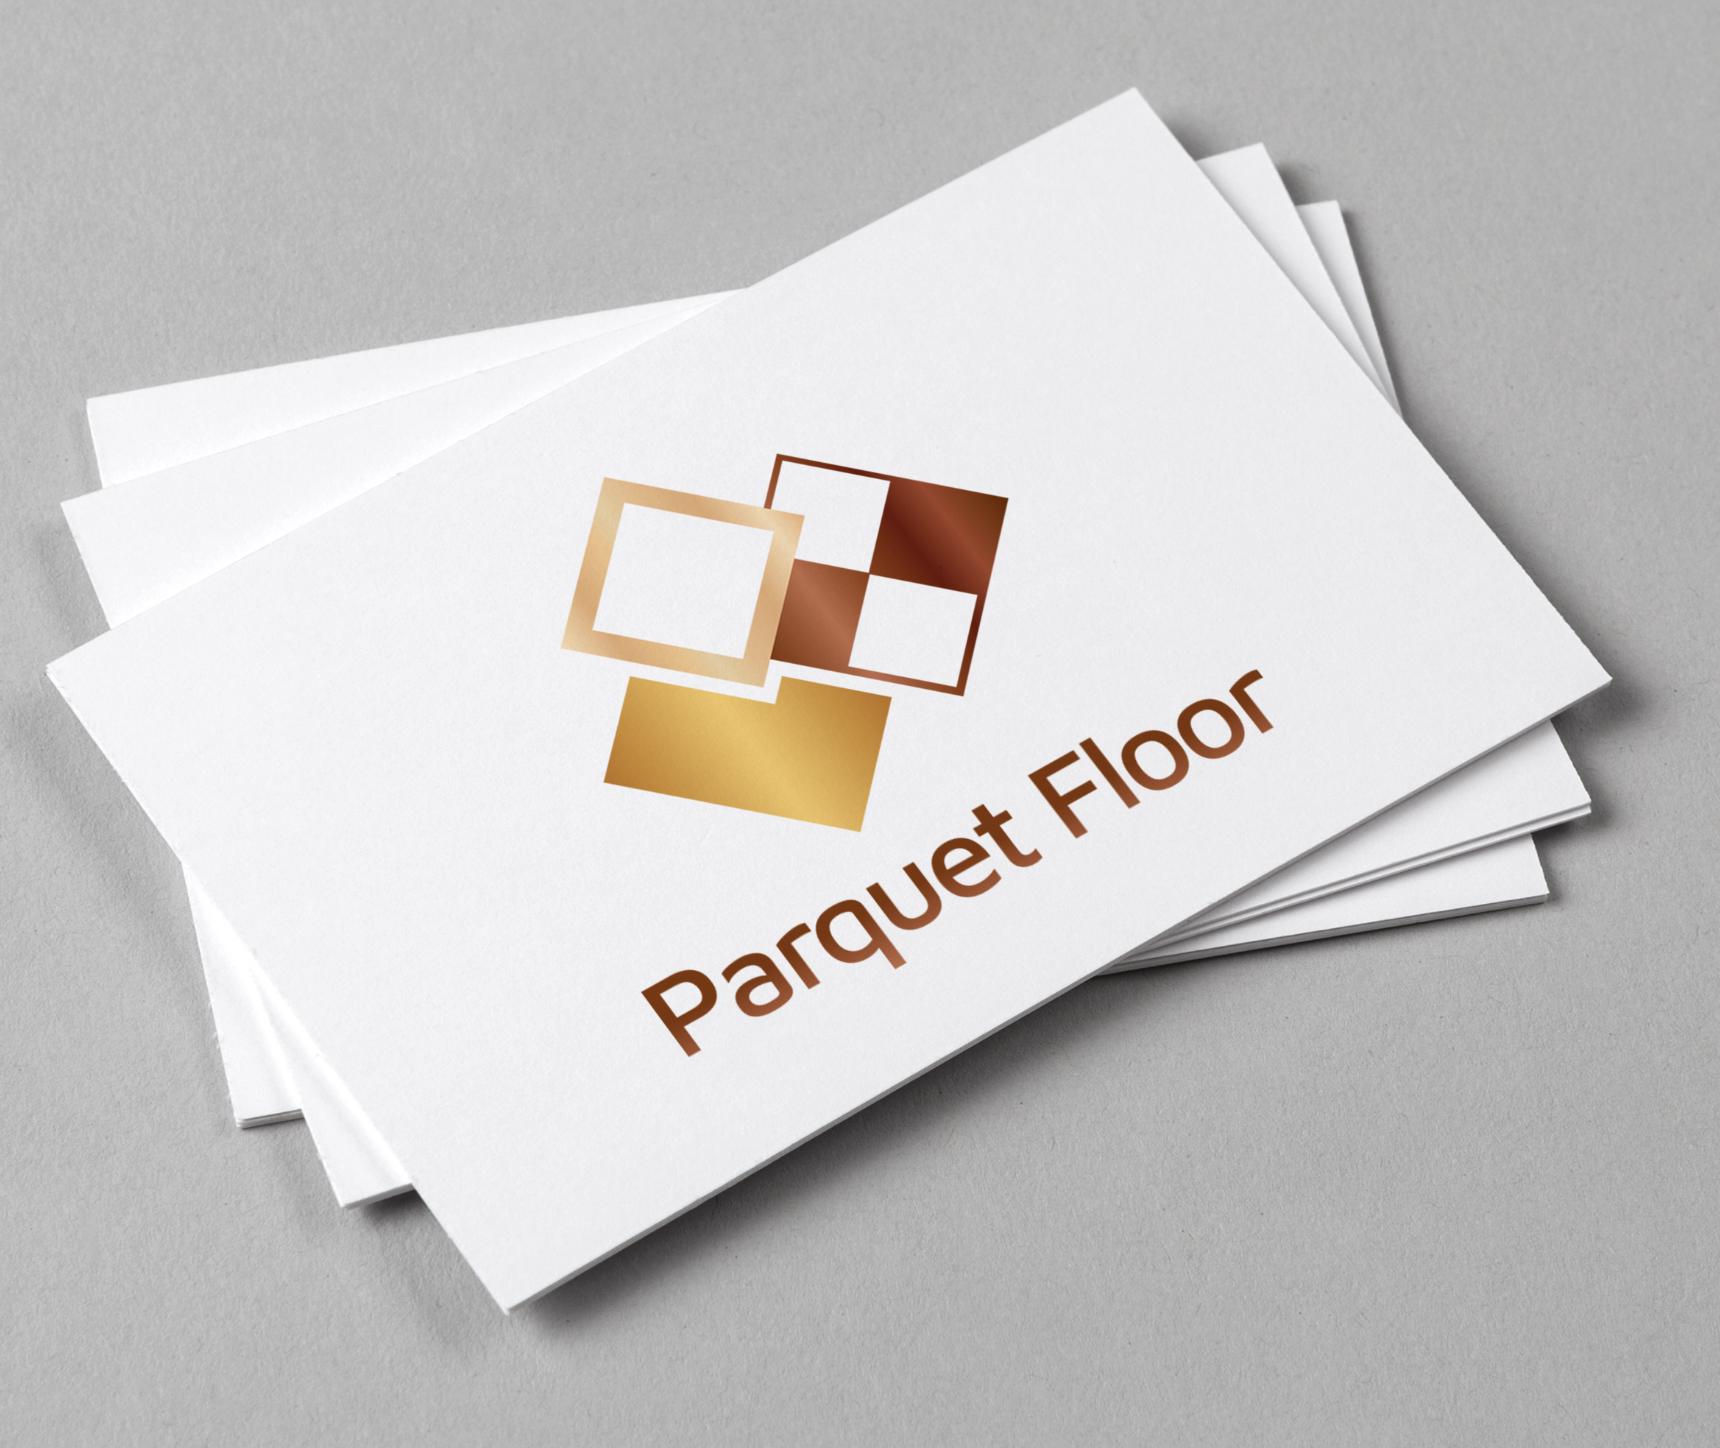 Parquet Flooring Logo Renovation Company Parquet Flooring Wooden Tile